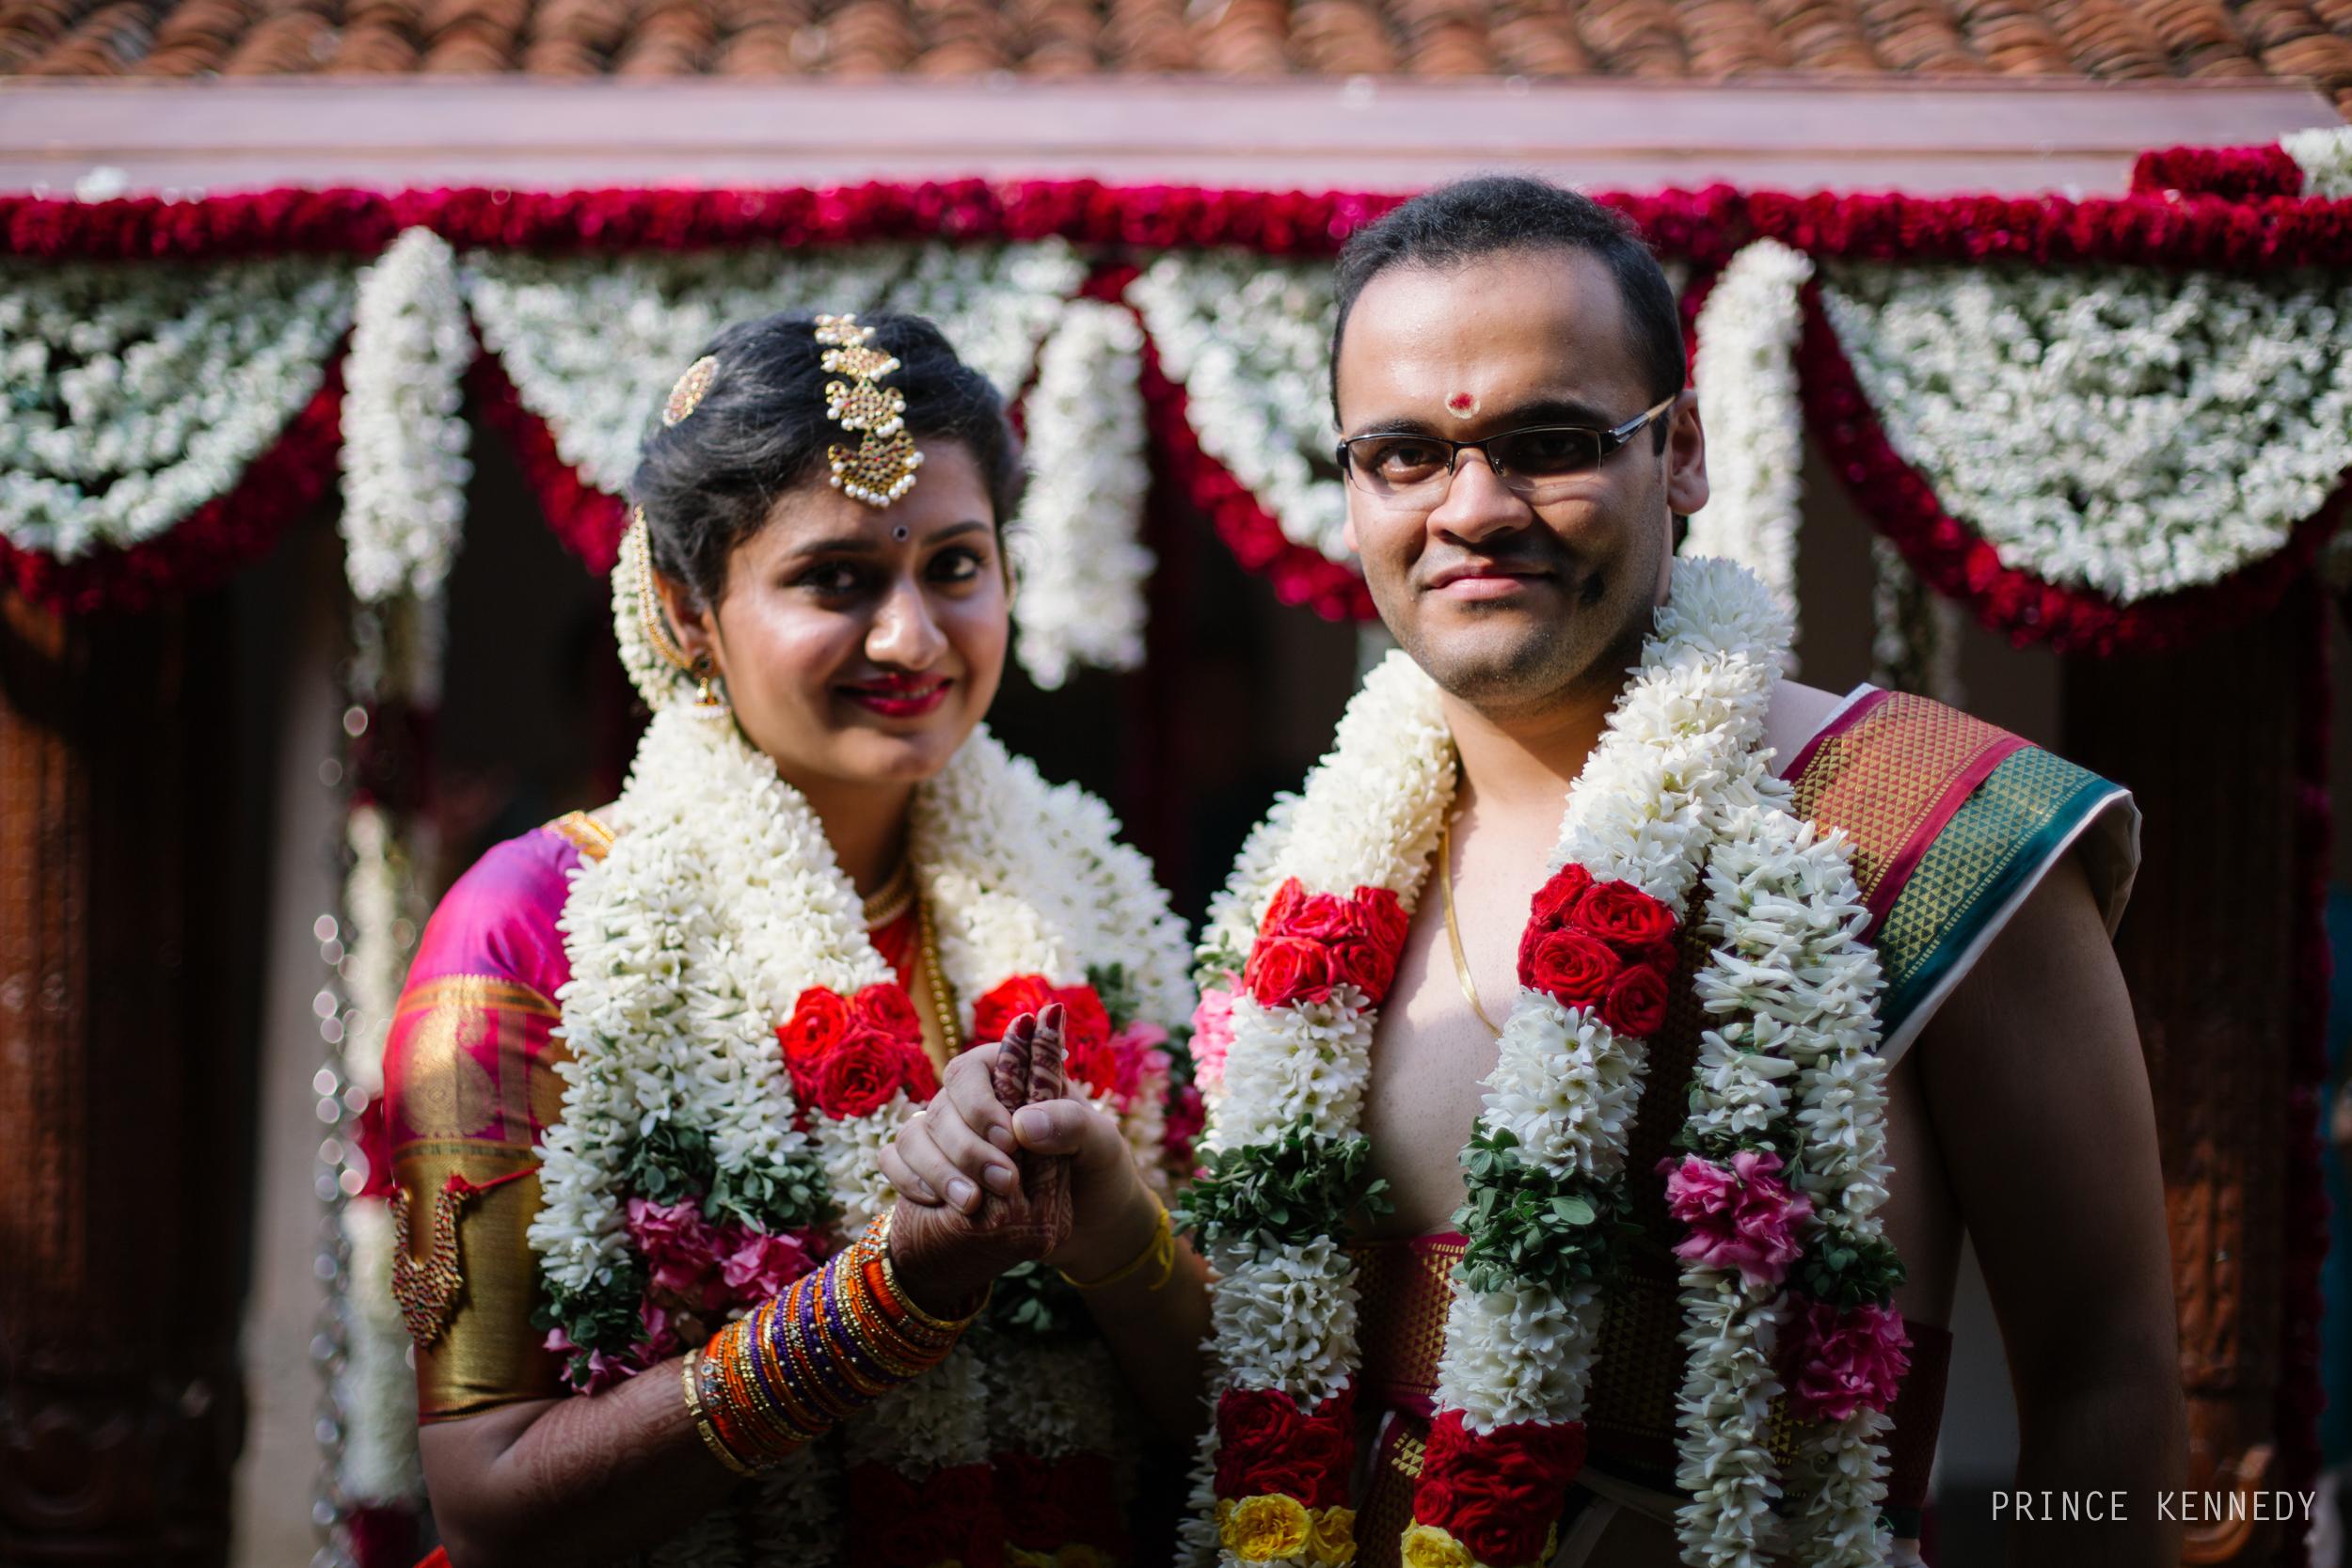 Athmajja-Nithesh-Engagement-Couple-Portrait-Portraiture-Wedding-Couple-Portrait-Chennai-Photographer-Candid-Photography-Destination-Best-Prince-Kennedy-Photography-191.jpg